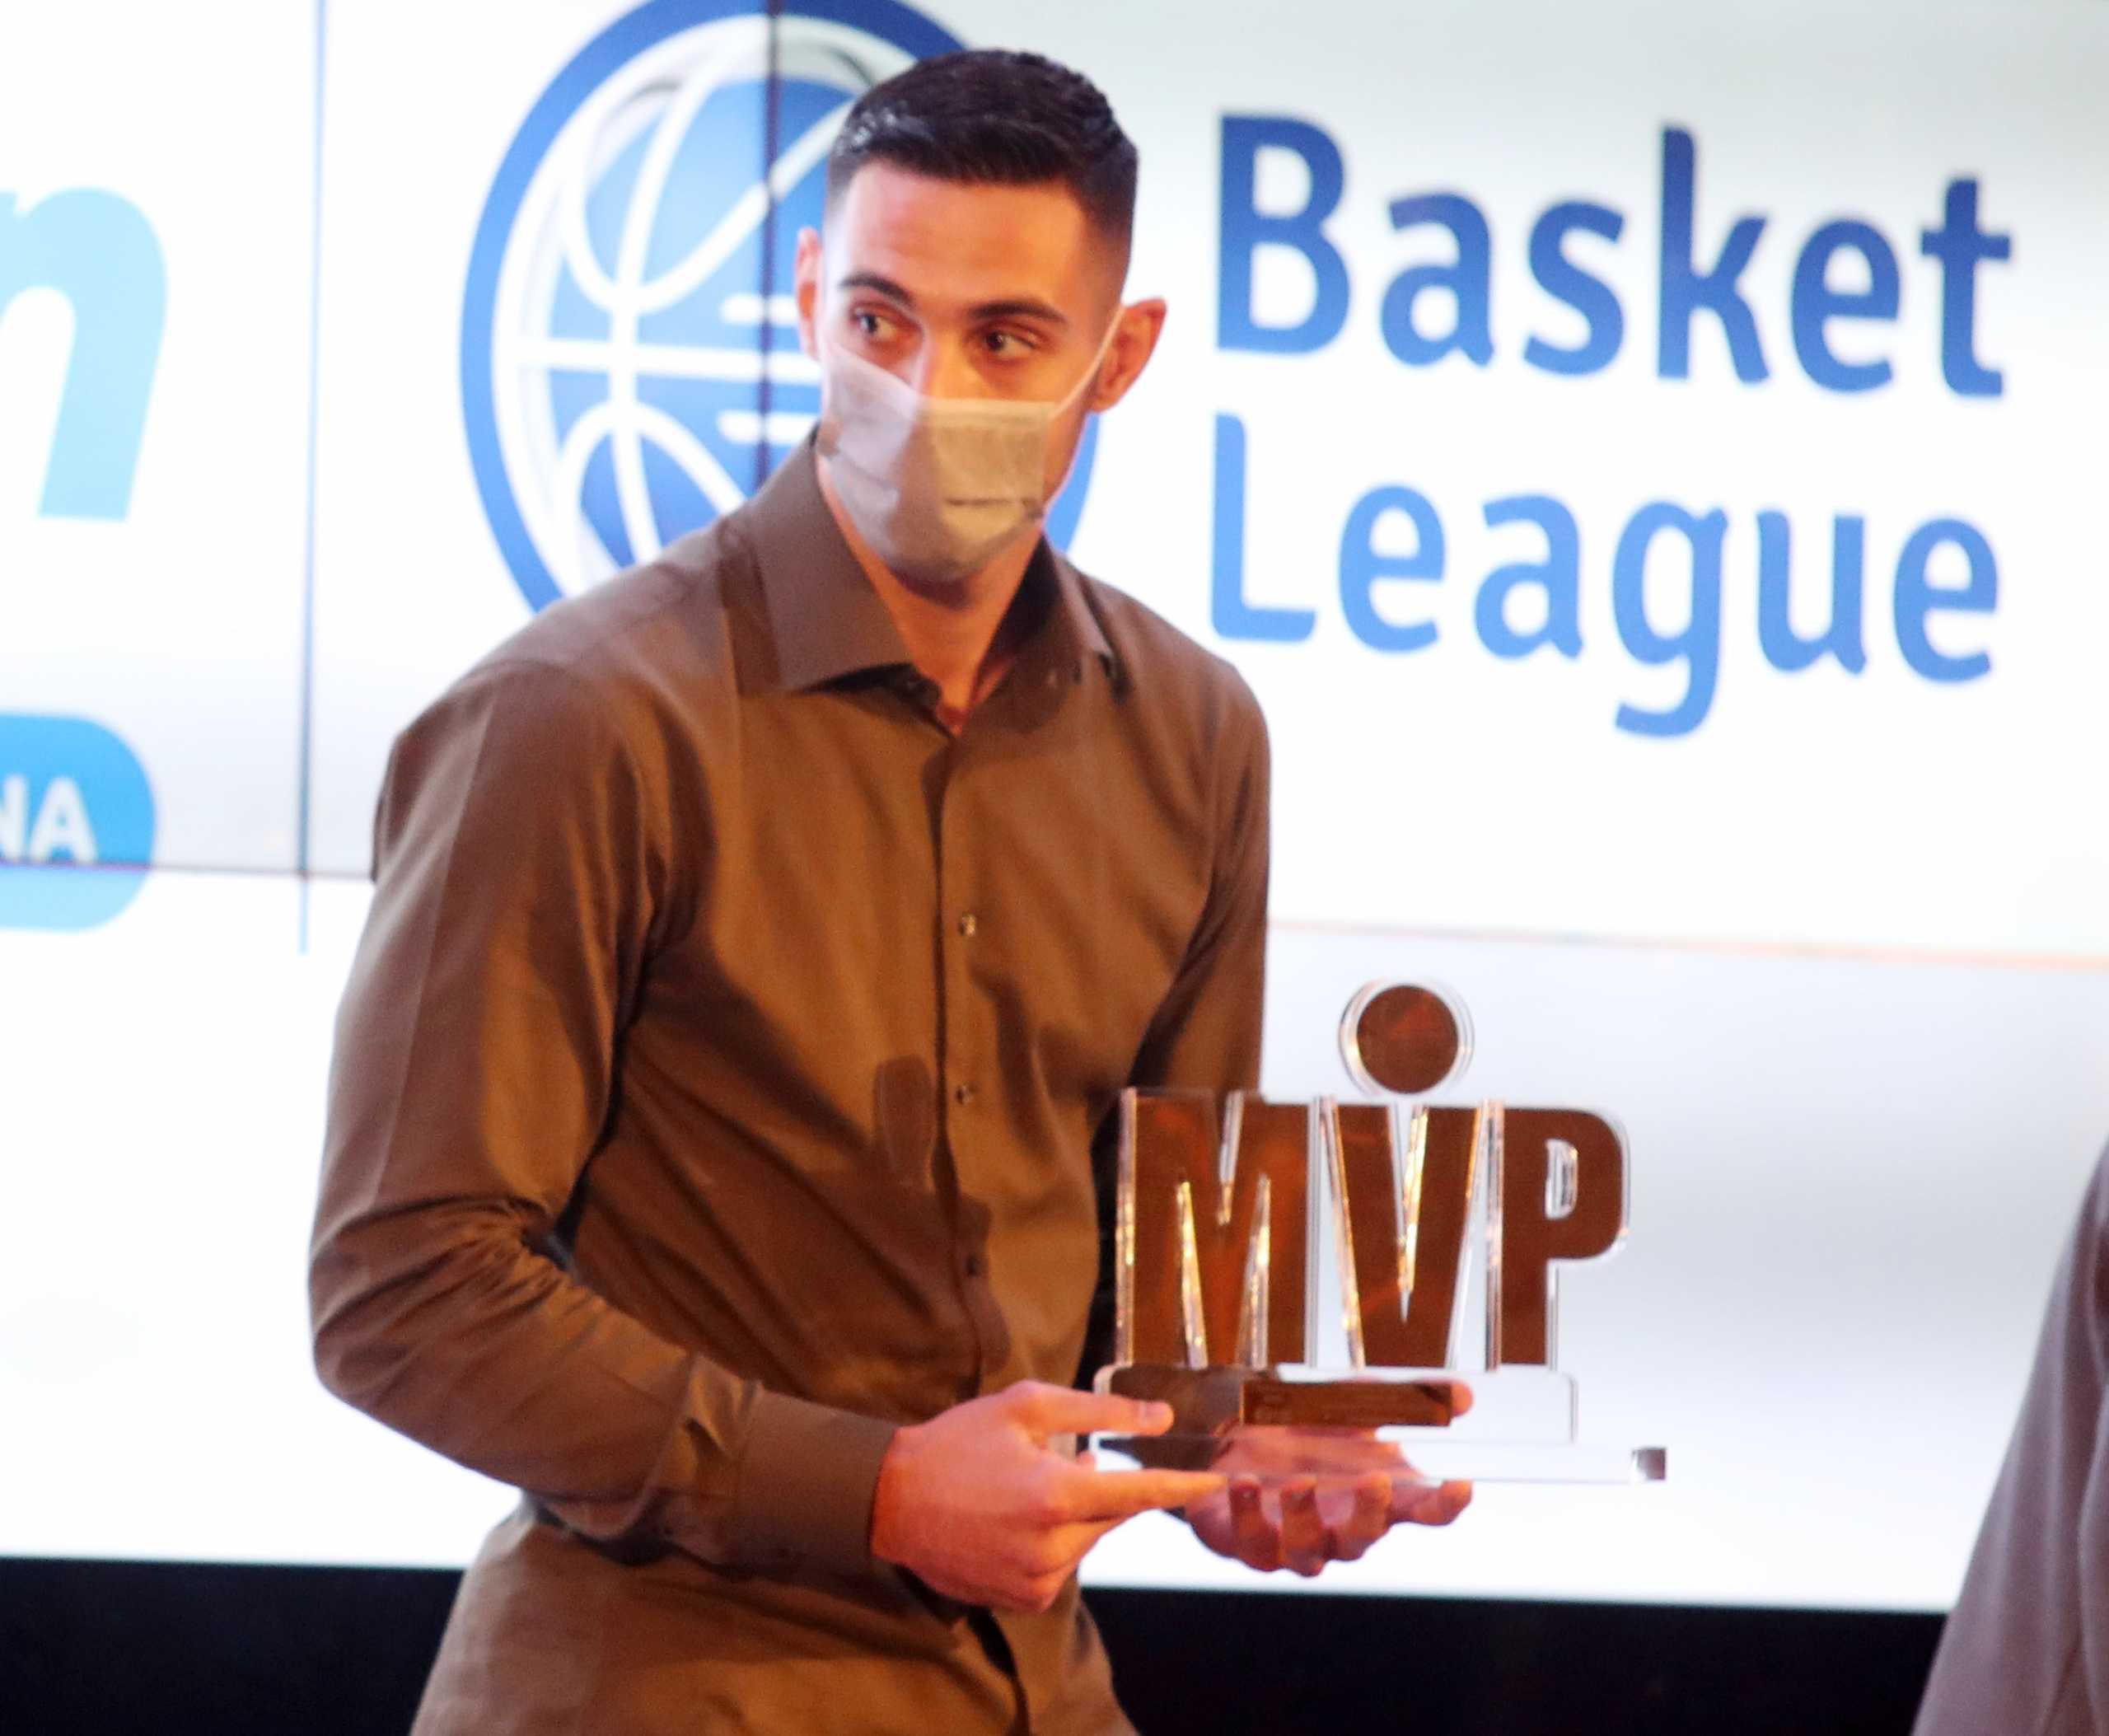 Basket League: Oι καλύτεροι της σεζόν με MVP τον Παπαπέτρου